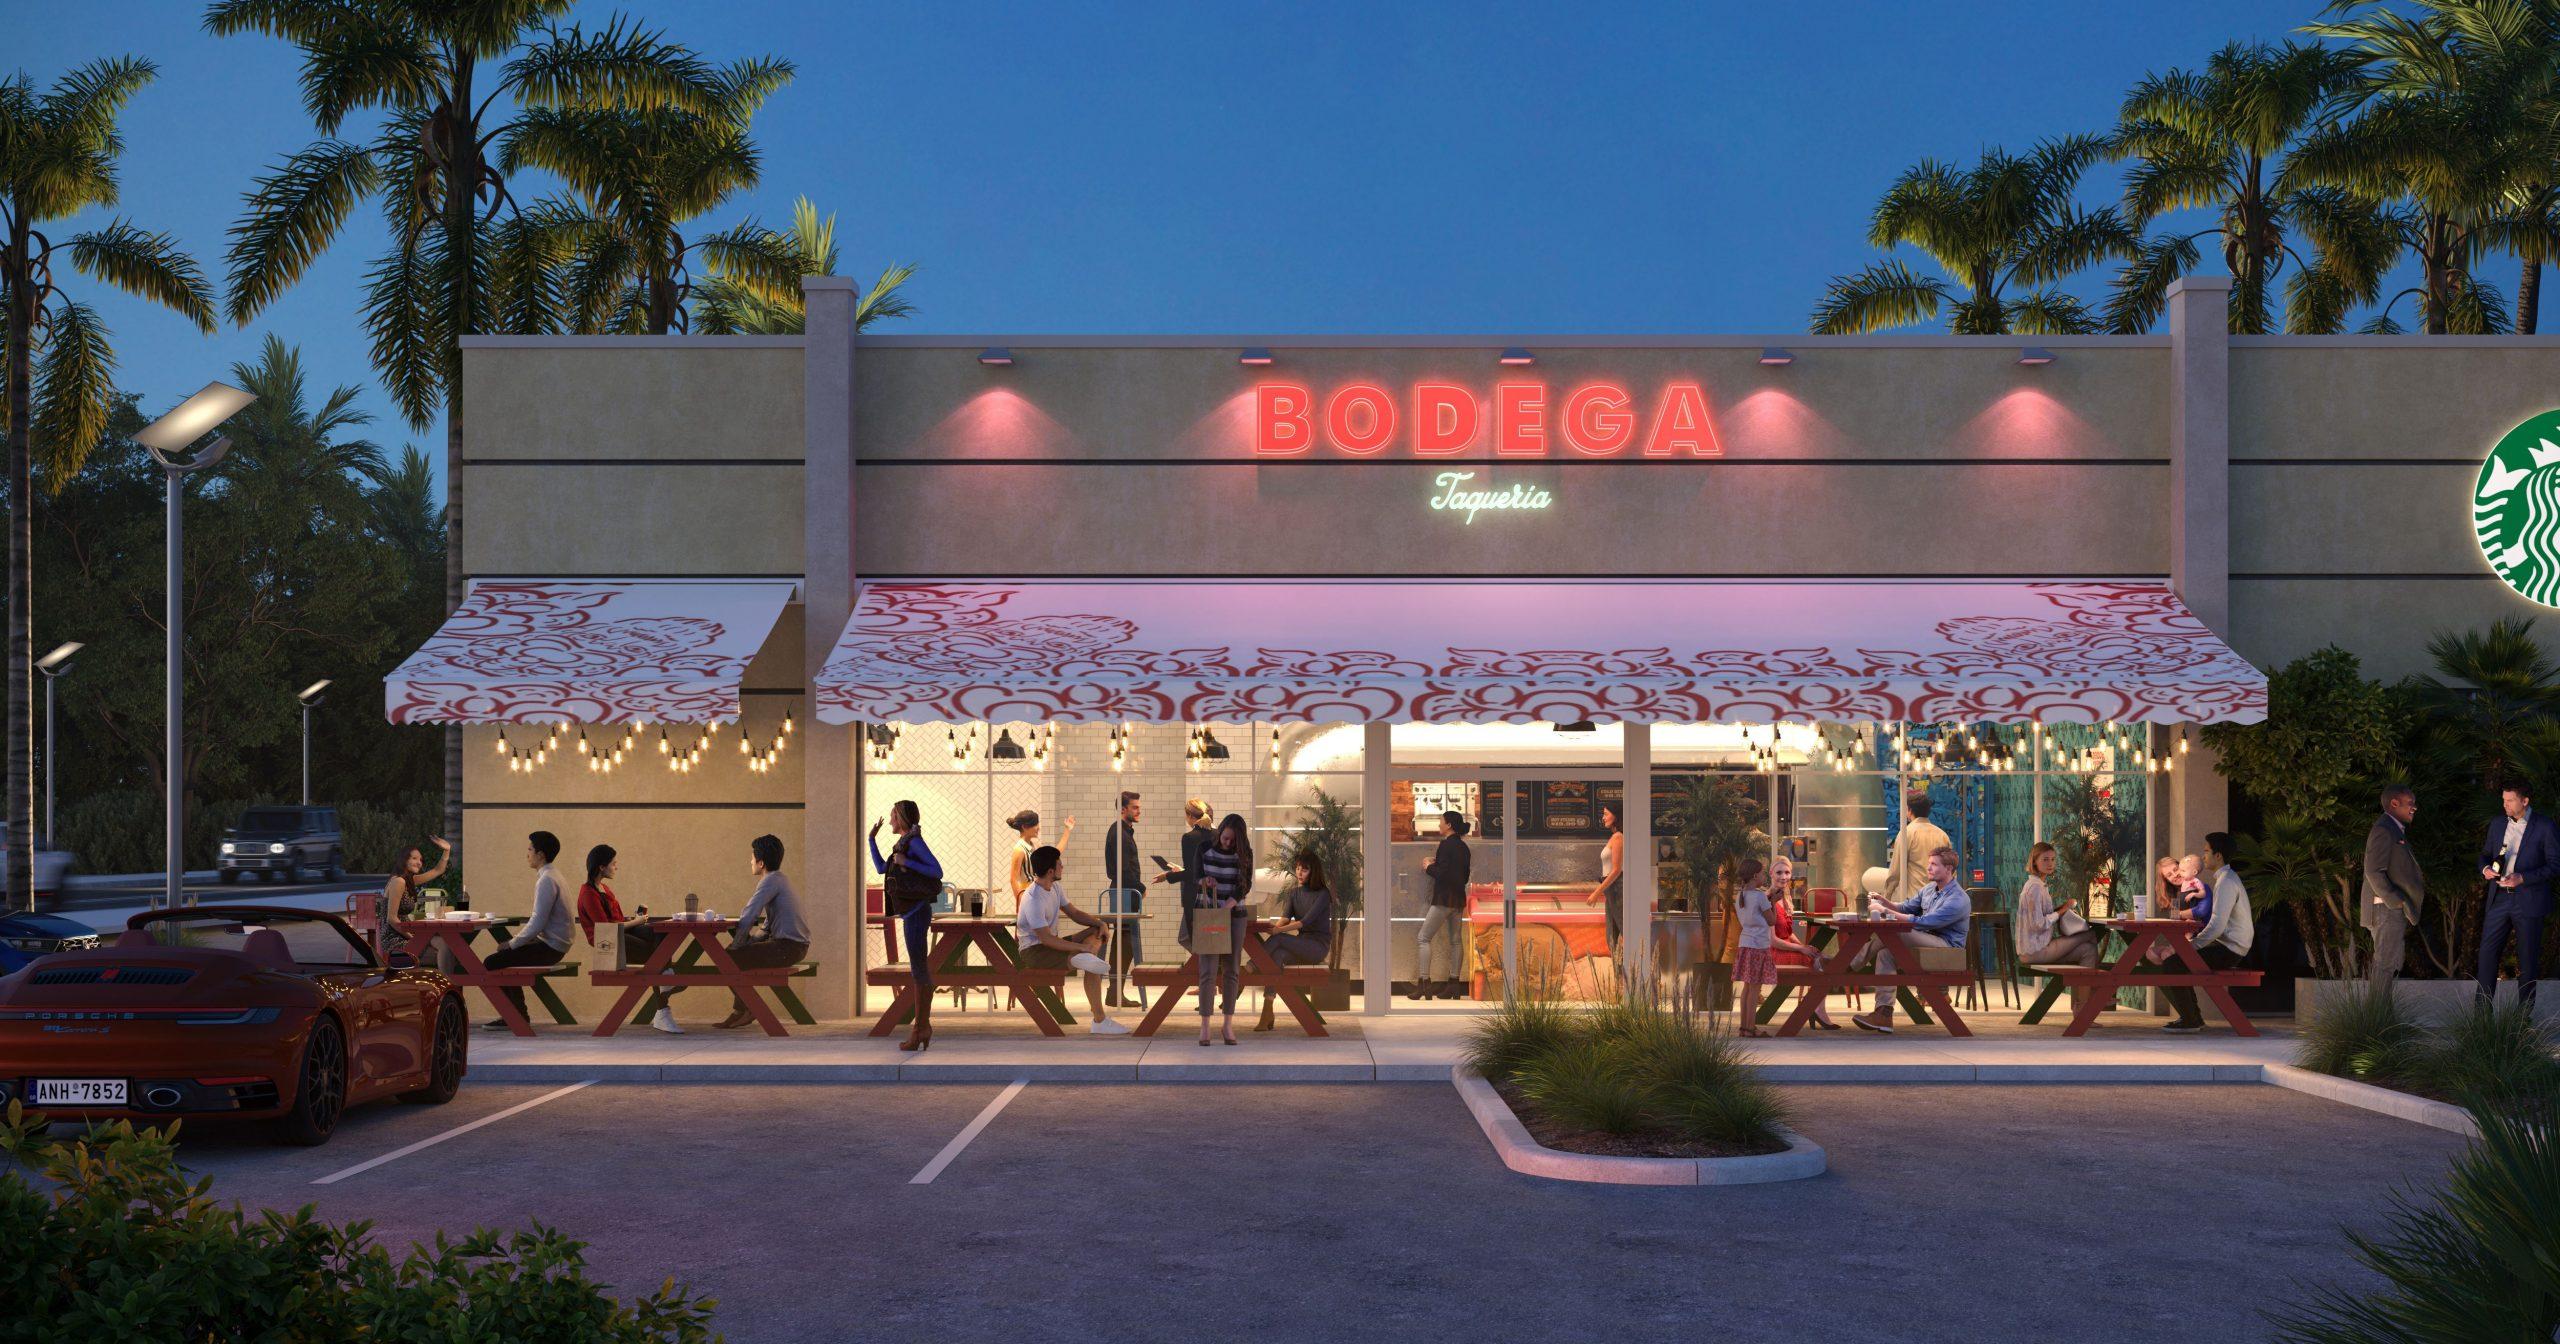 Bodega to open in Aventura on August 13!